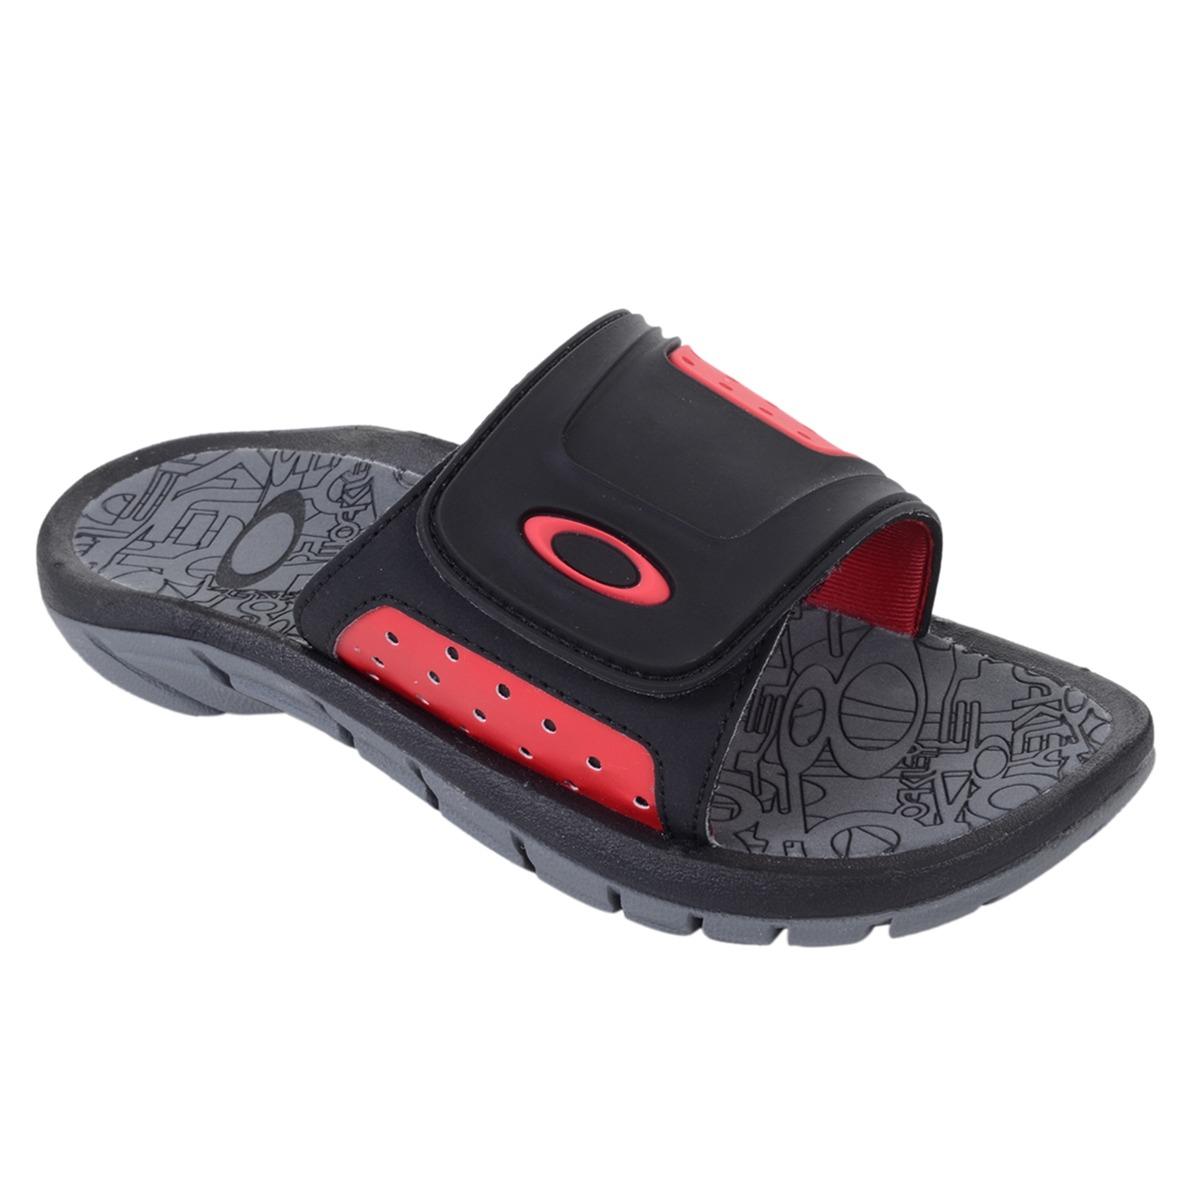 89c78997965b4 chinelo masculino oakley supercoil slide preto vermelho. Carregando zoom.